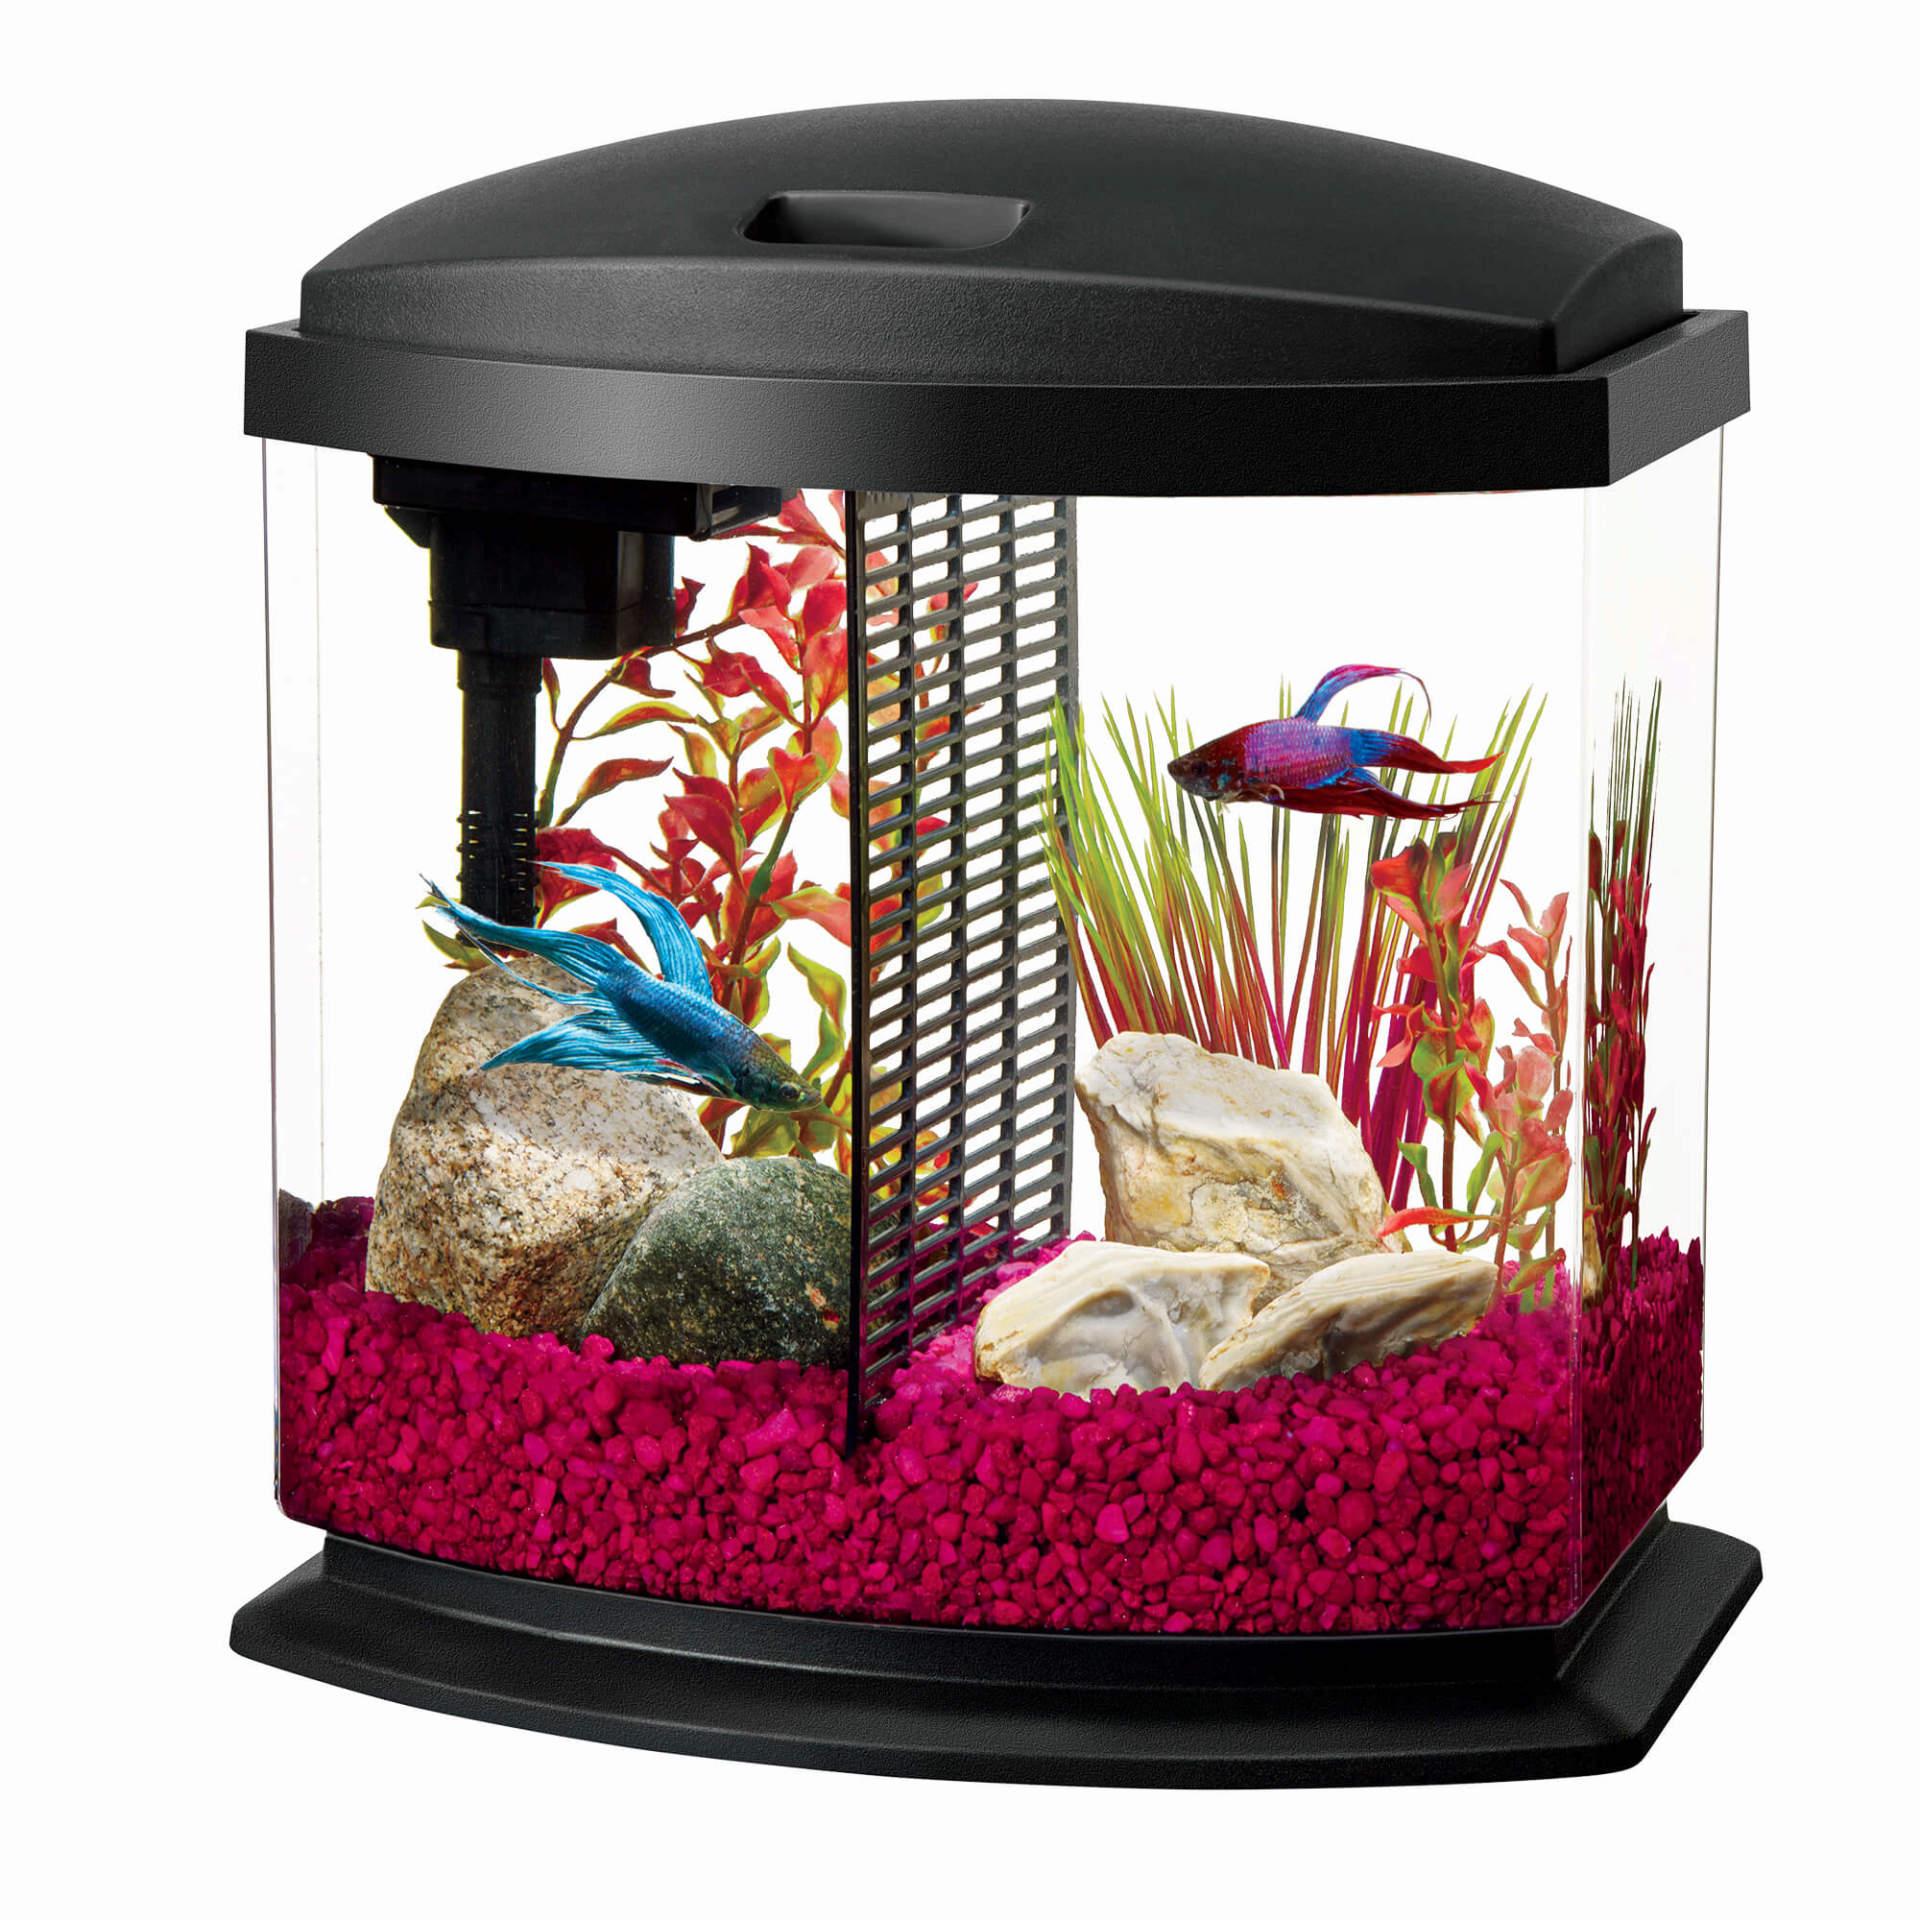 Aqueon BettaBow 2.5 Desktop Aquarium Kit